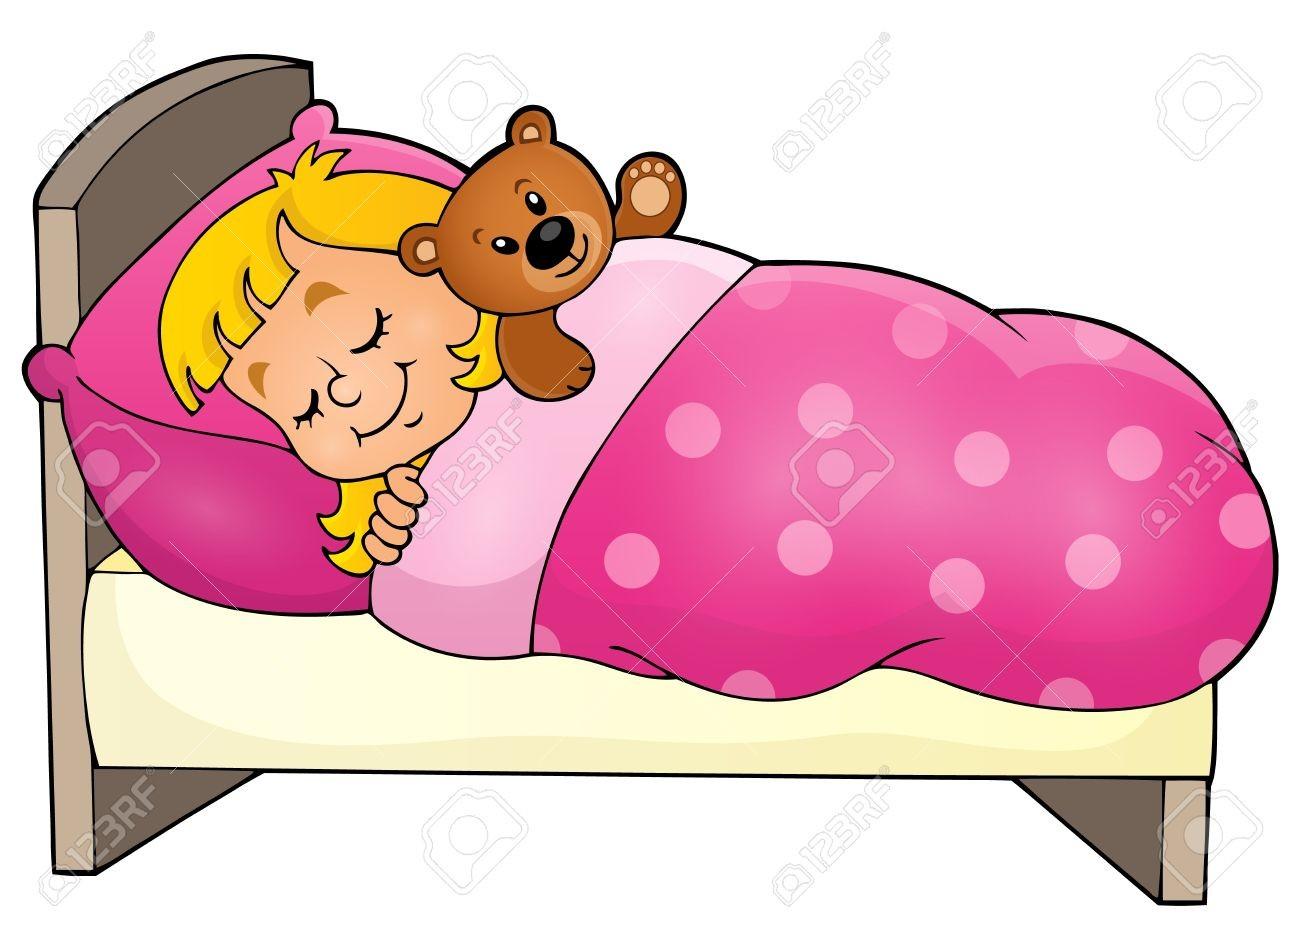 sleep clip art. Clipart sleeping child's